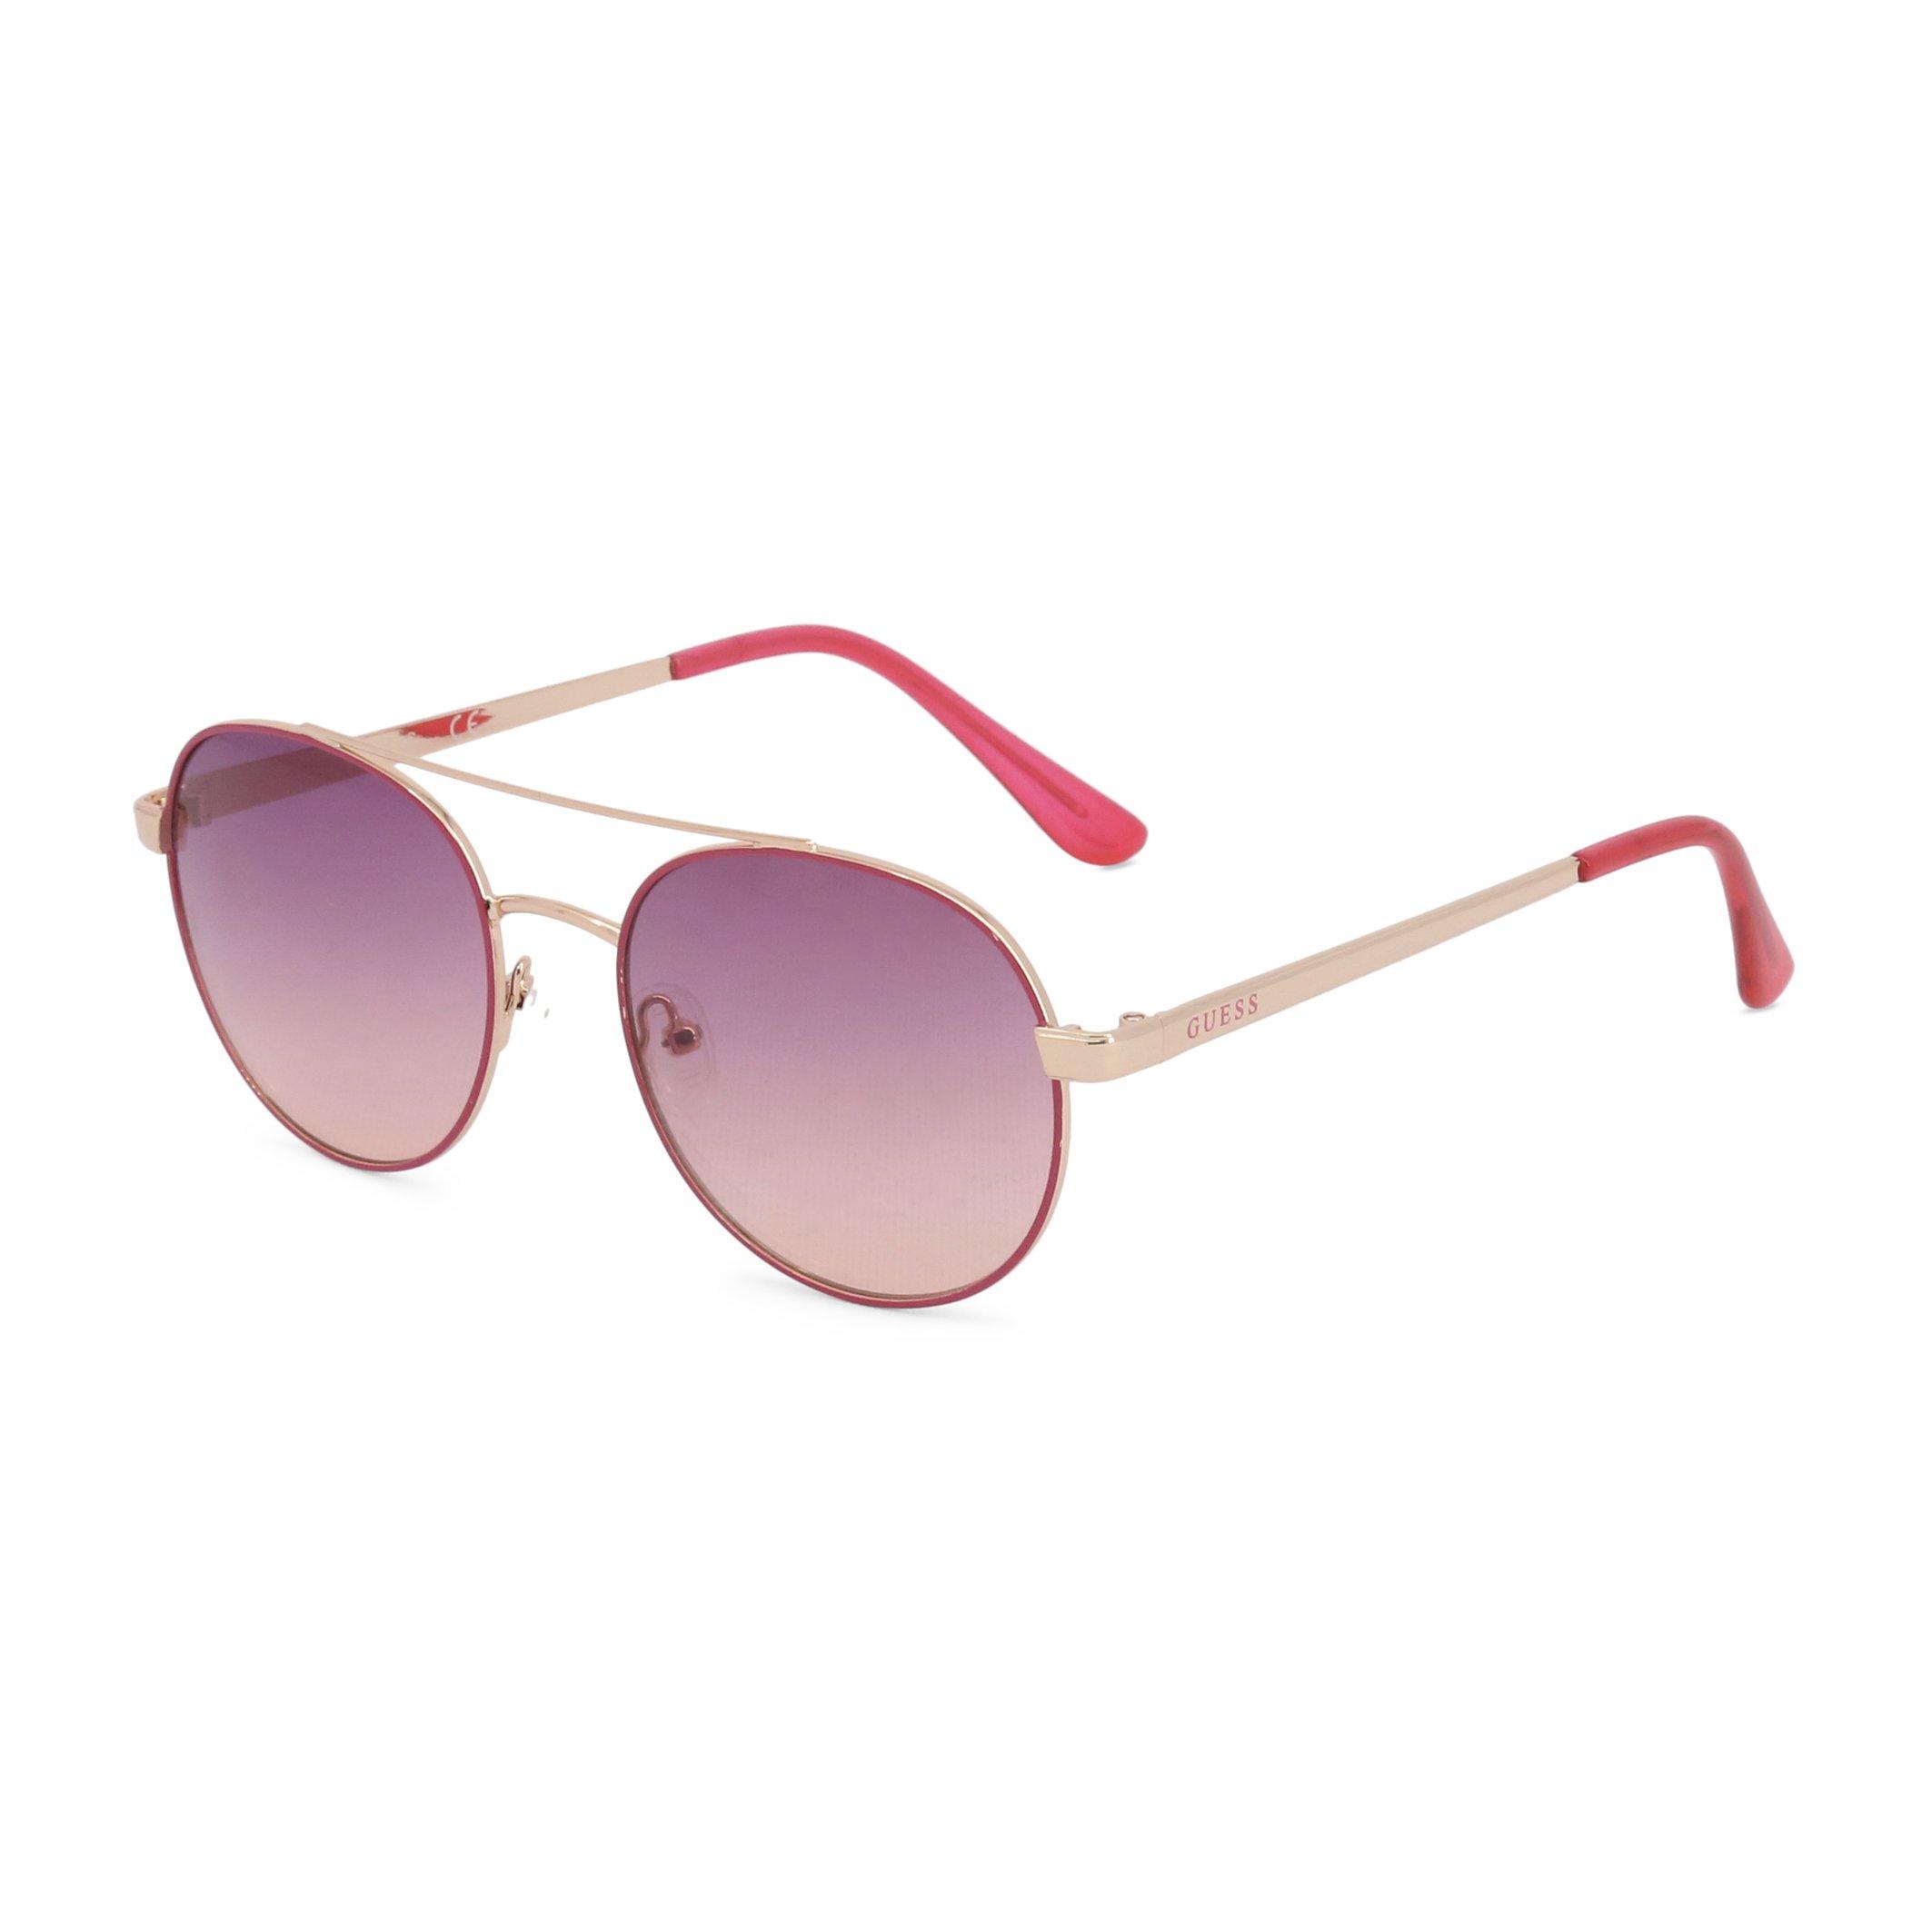 Guess Women's Sunglasses Various Colours GF0367 - pink NOSIZE